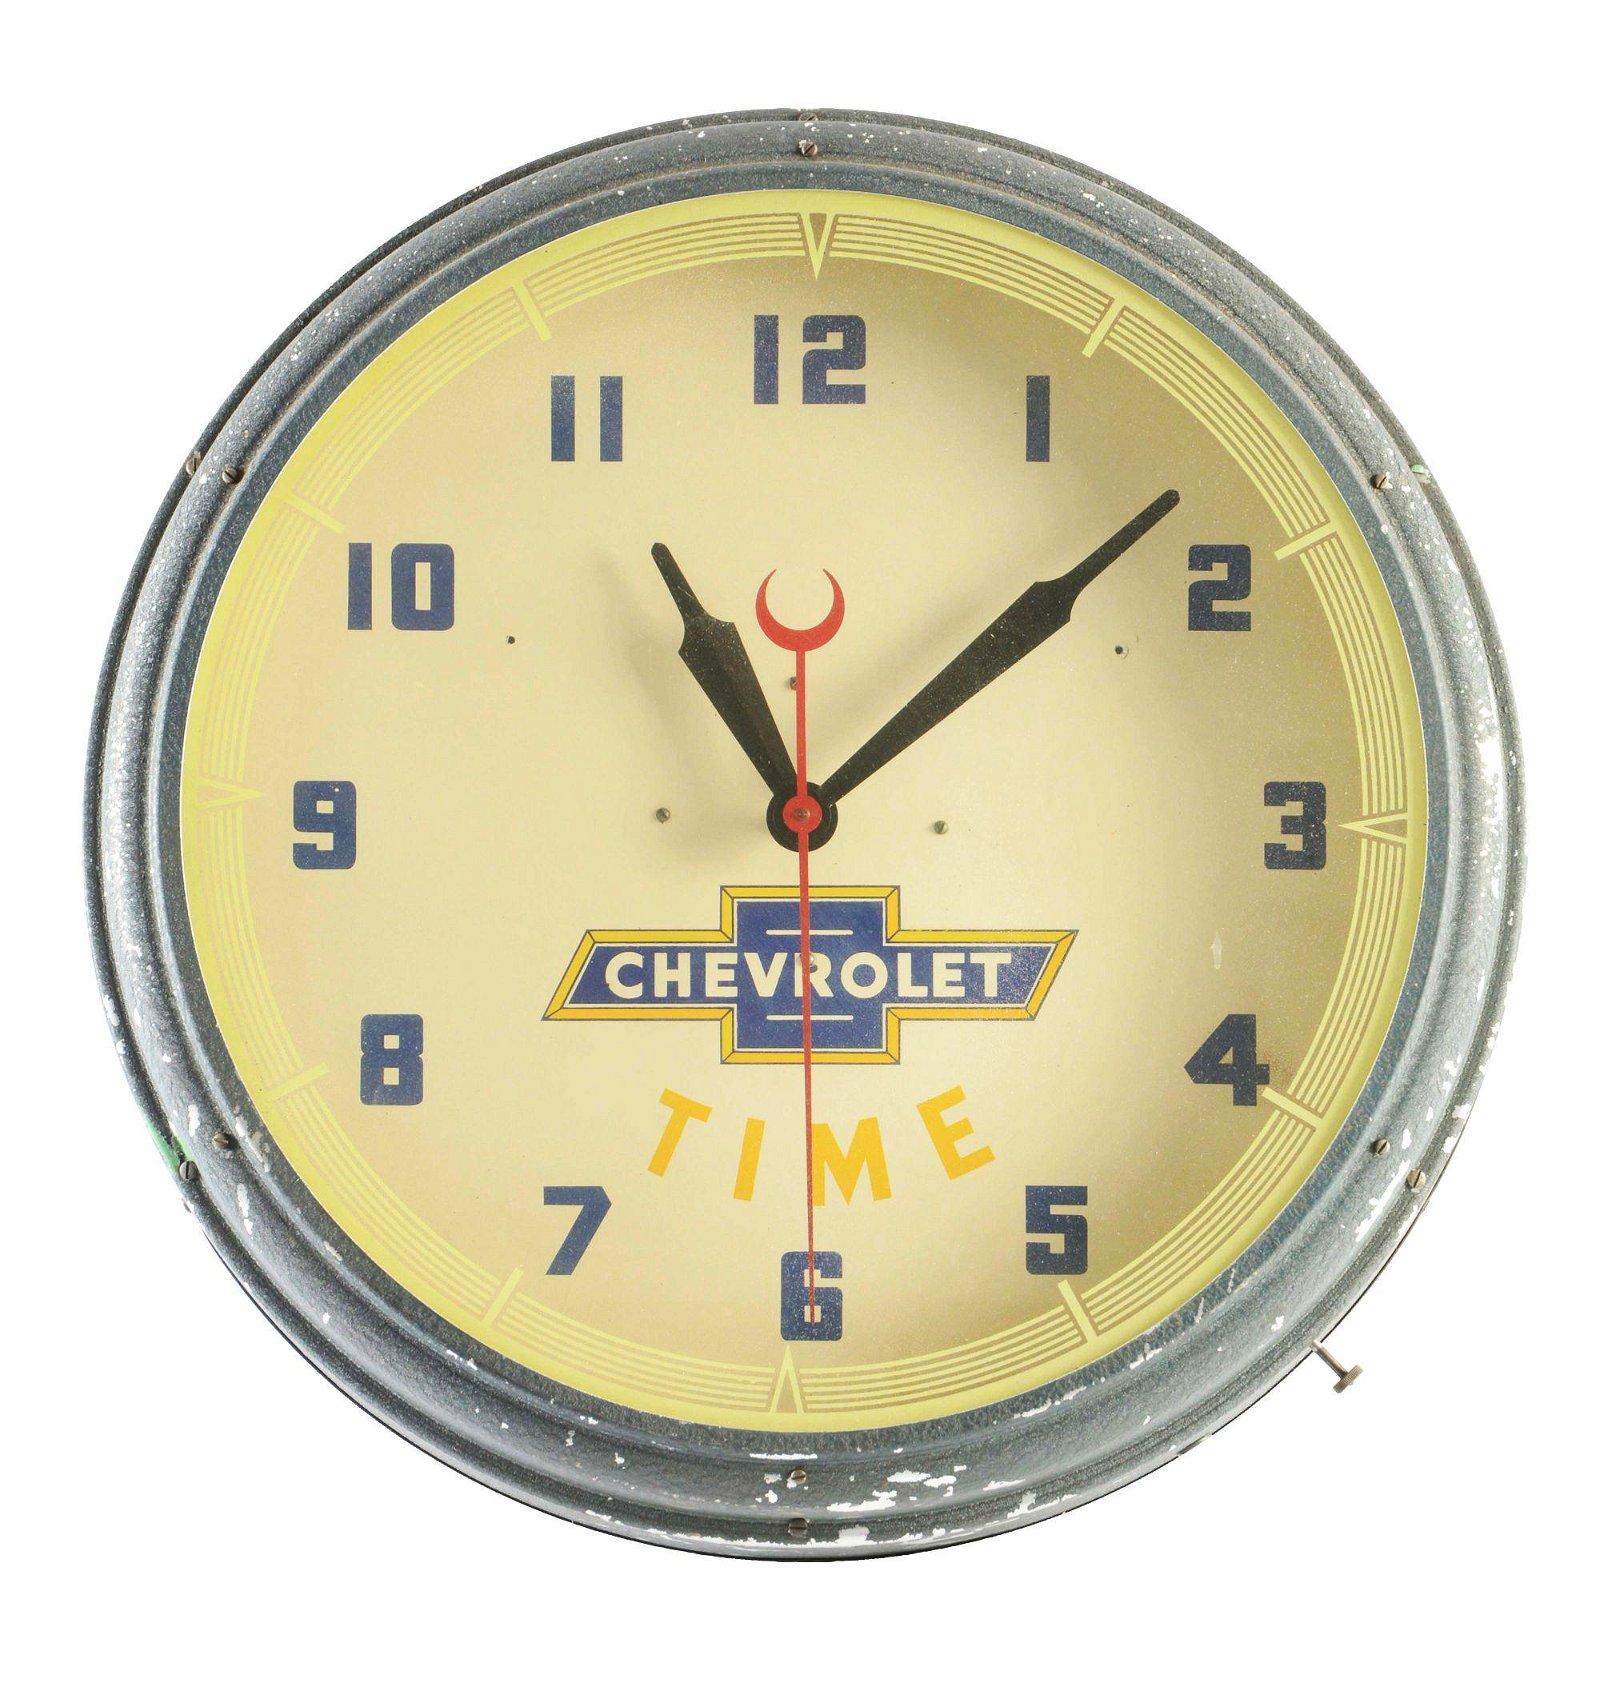 Chevrolet Time Neon Dealership Clock.